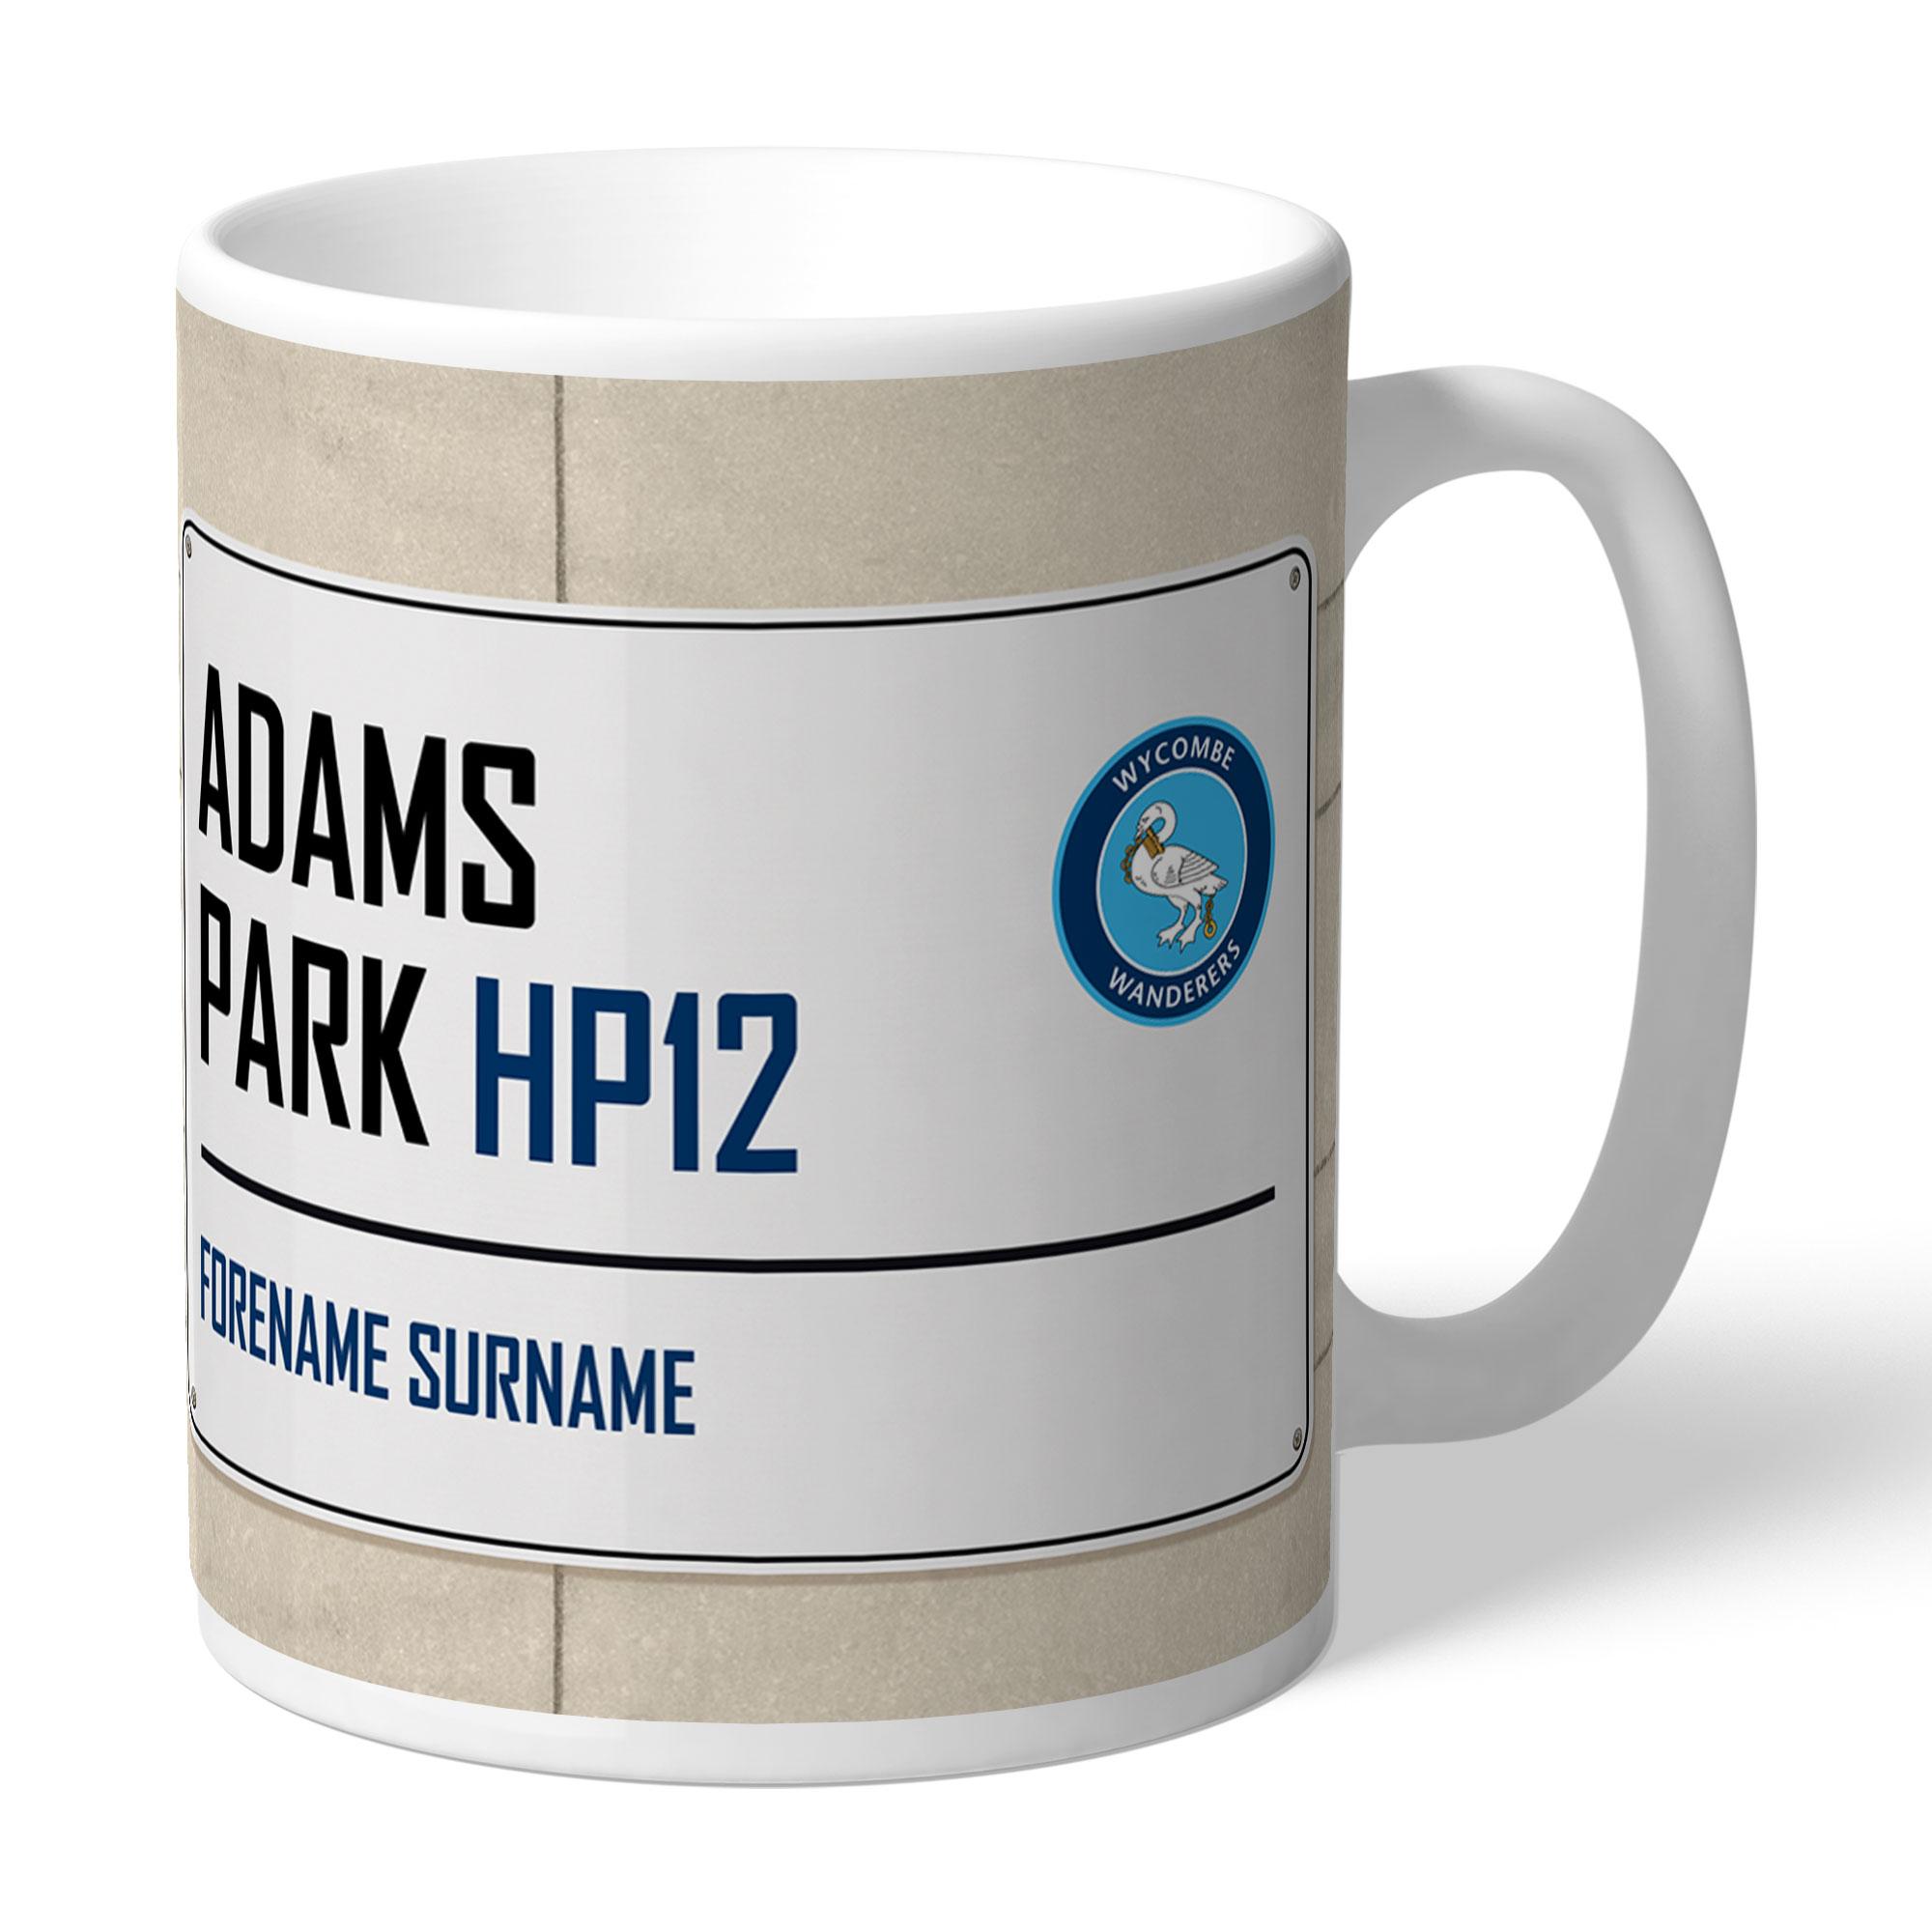 Wycombe Wanderers Street Sign Mug